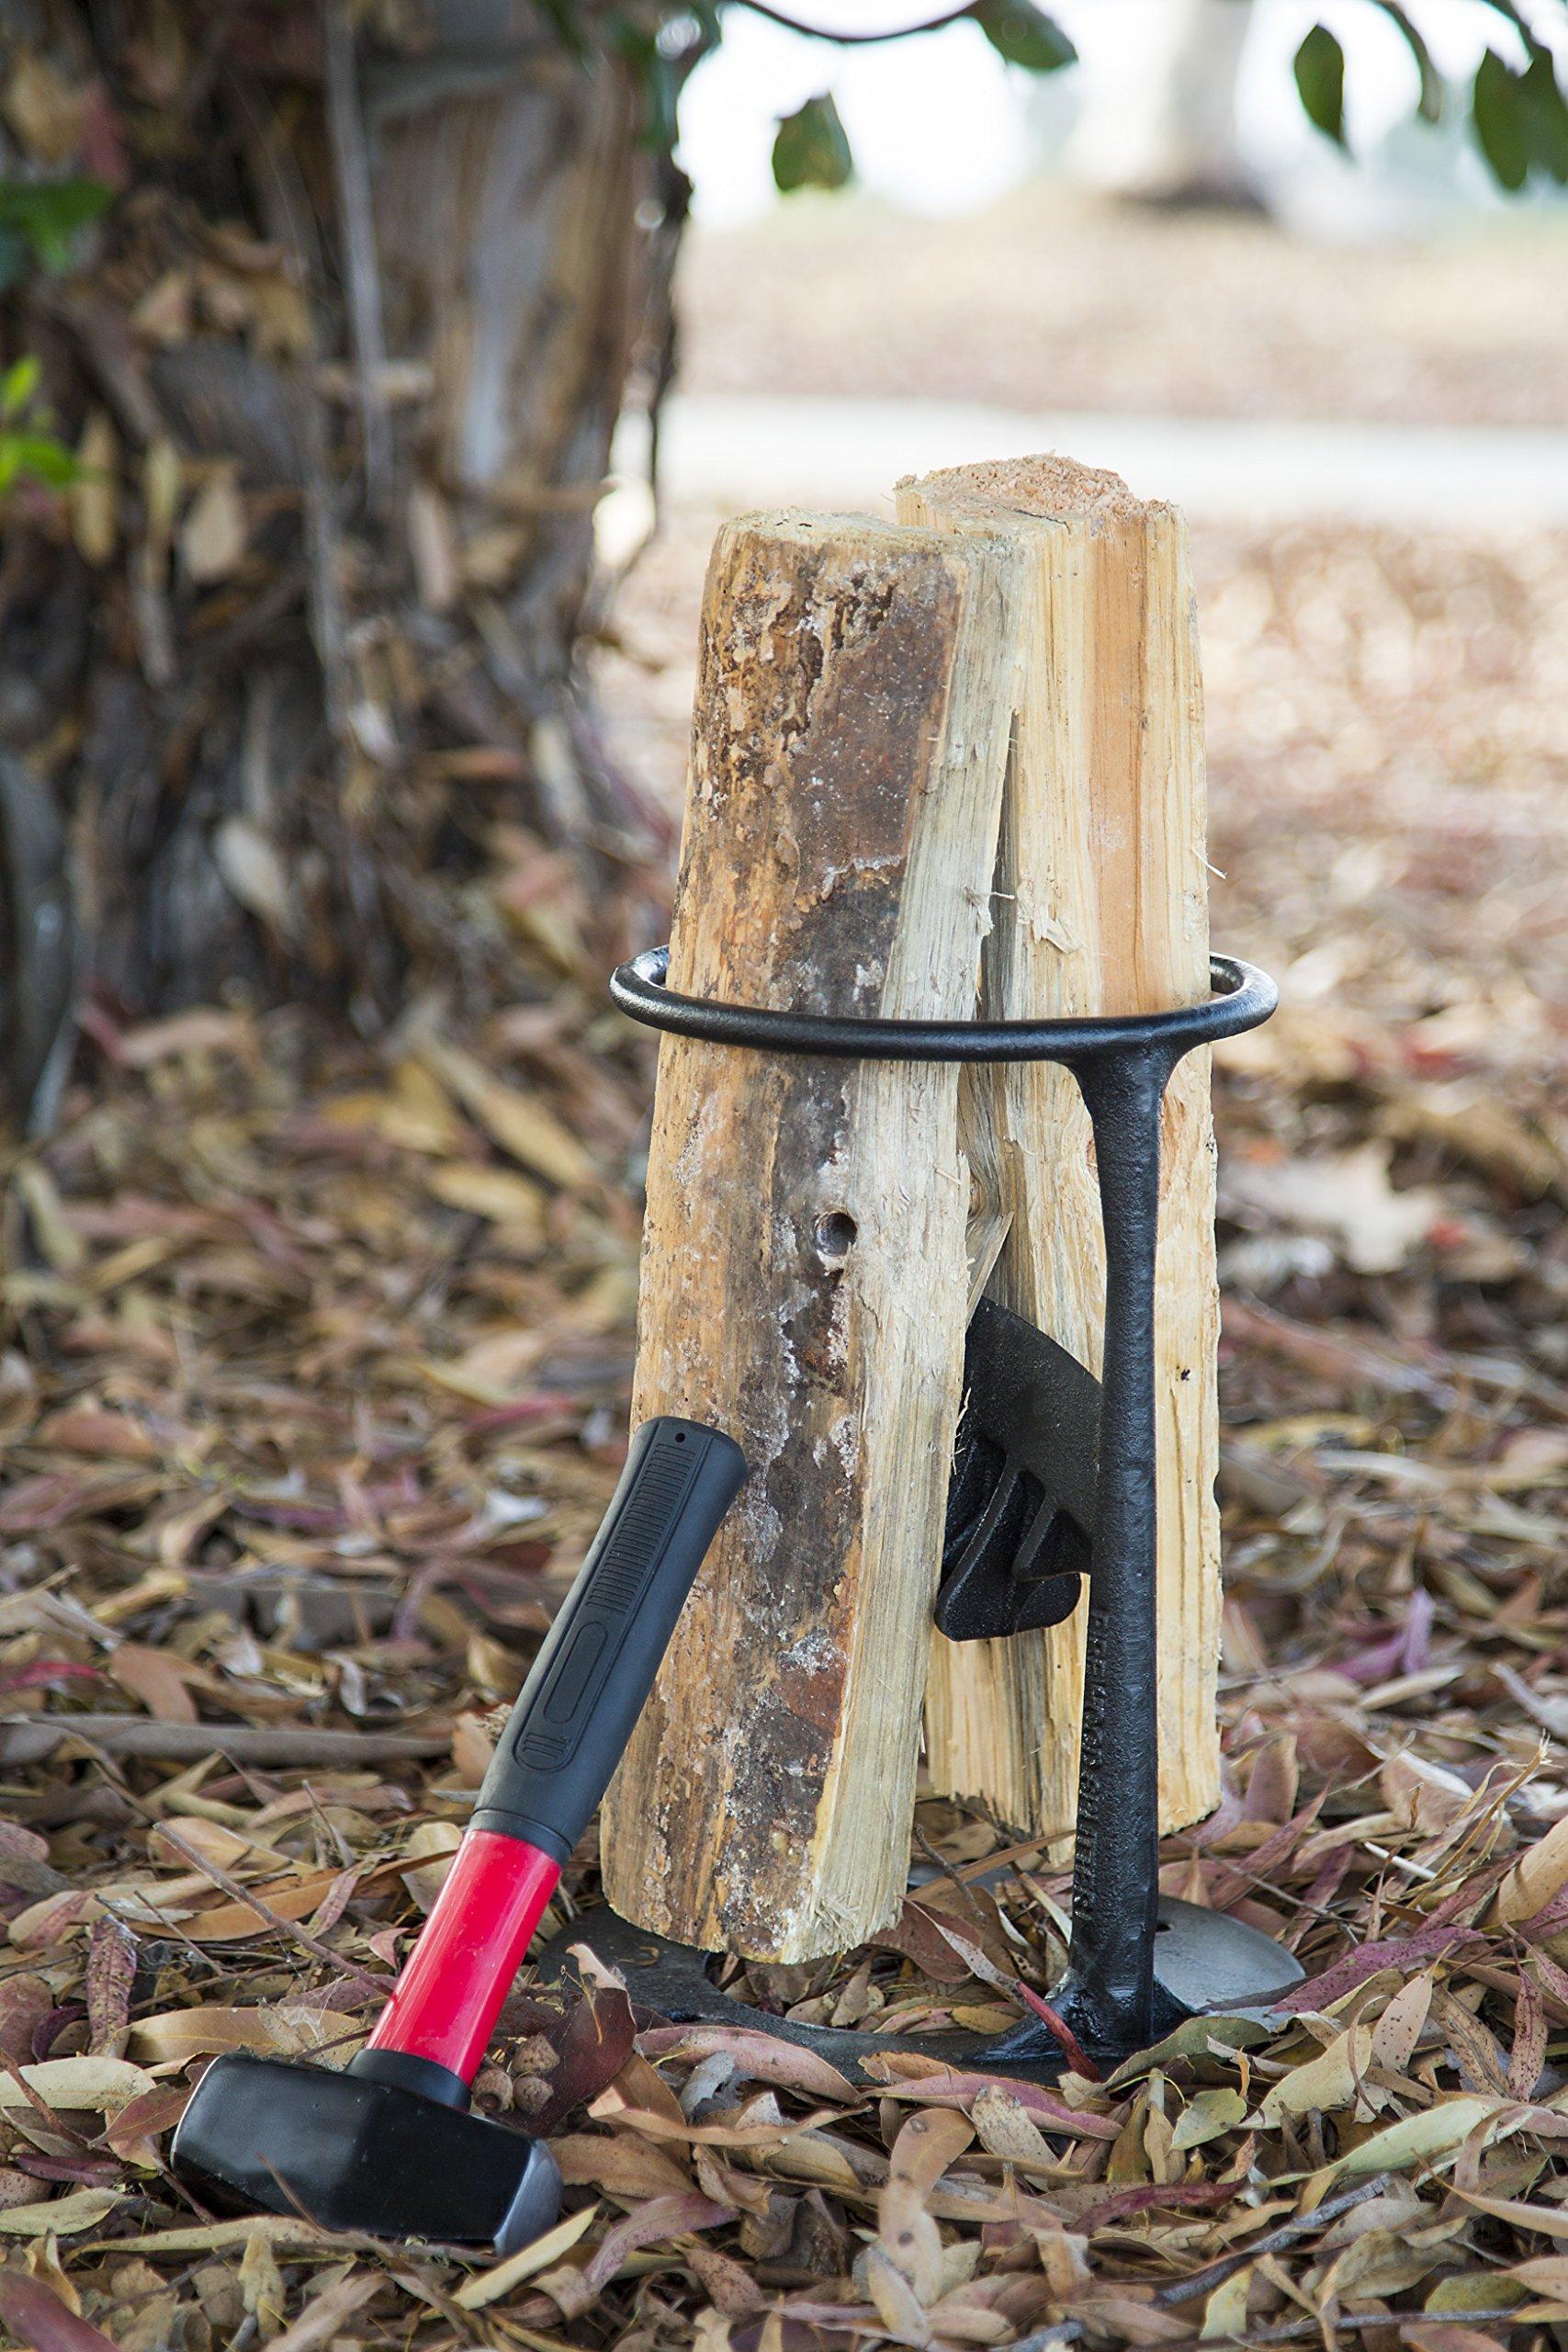 Inertia Wood Splitter - Cast Iron Manual Log Splitter - No Sharp Edges - No More Axes! by Inertia Gear (Image #3)